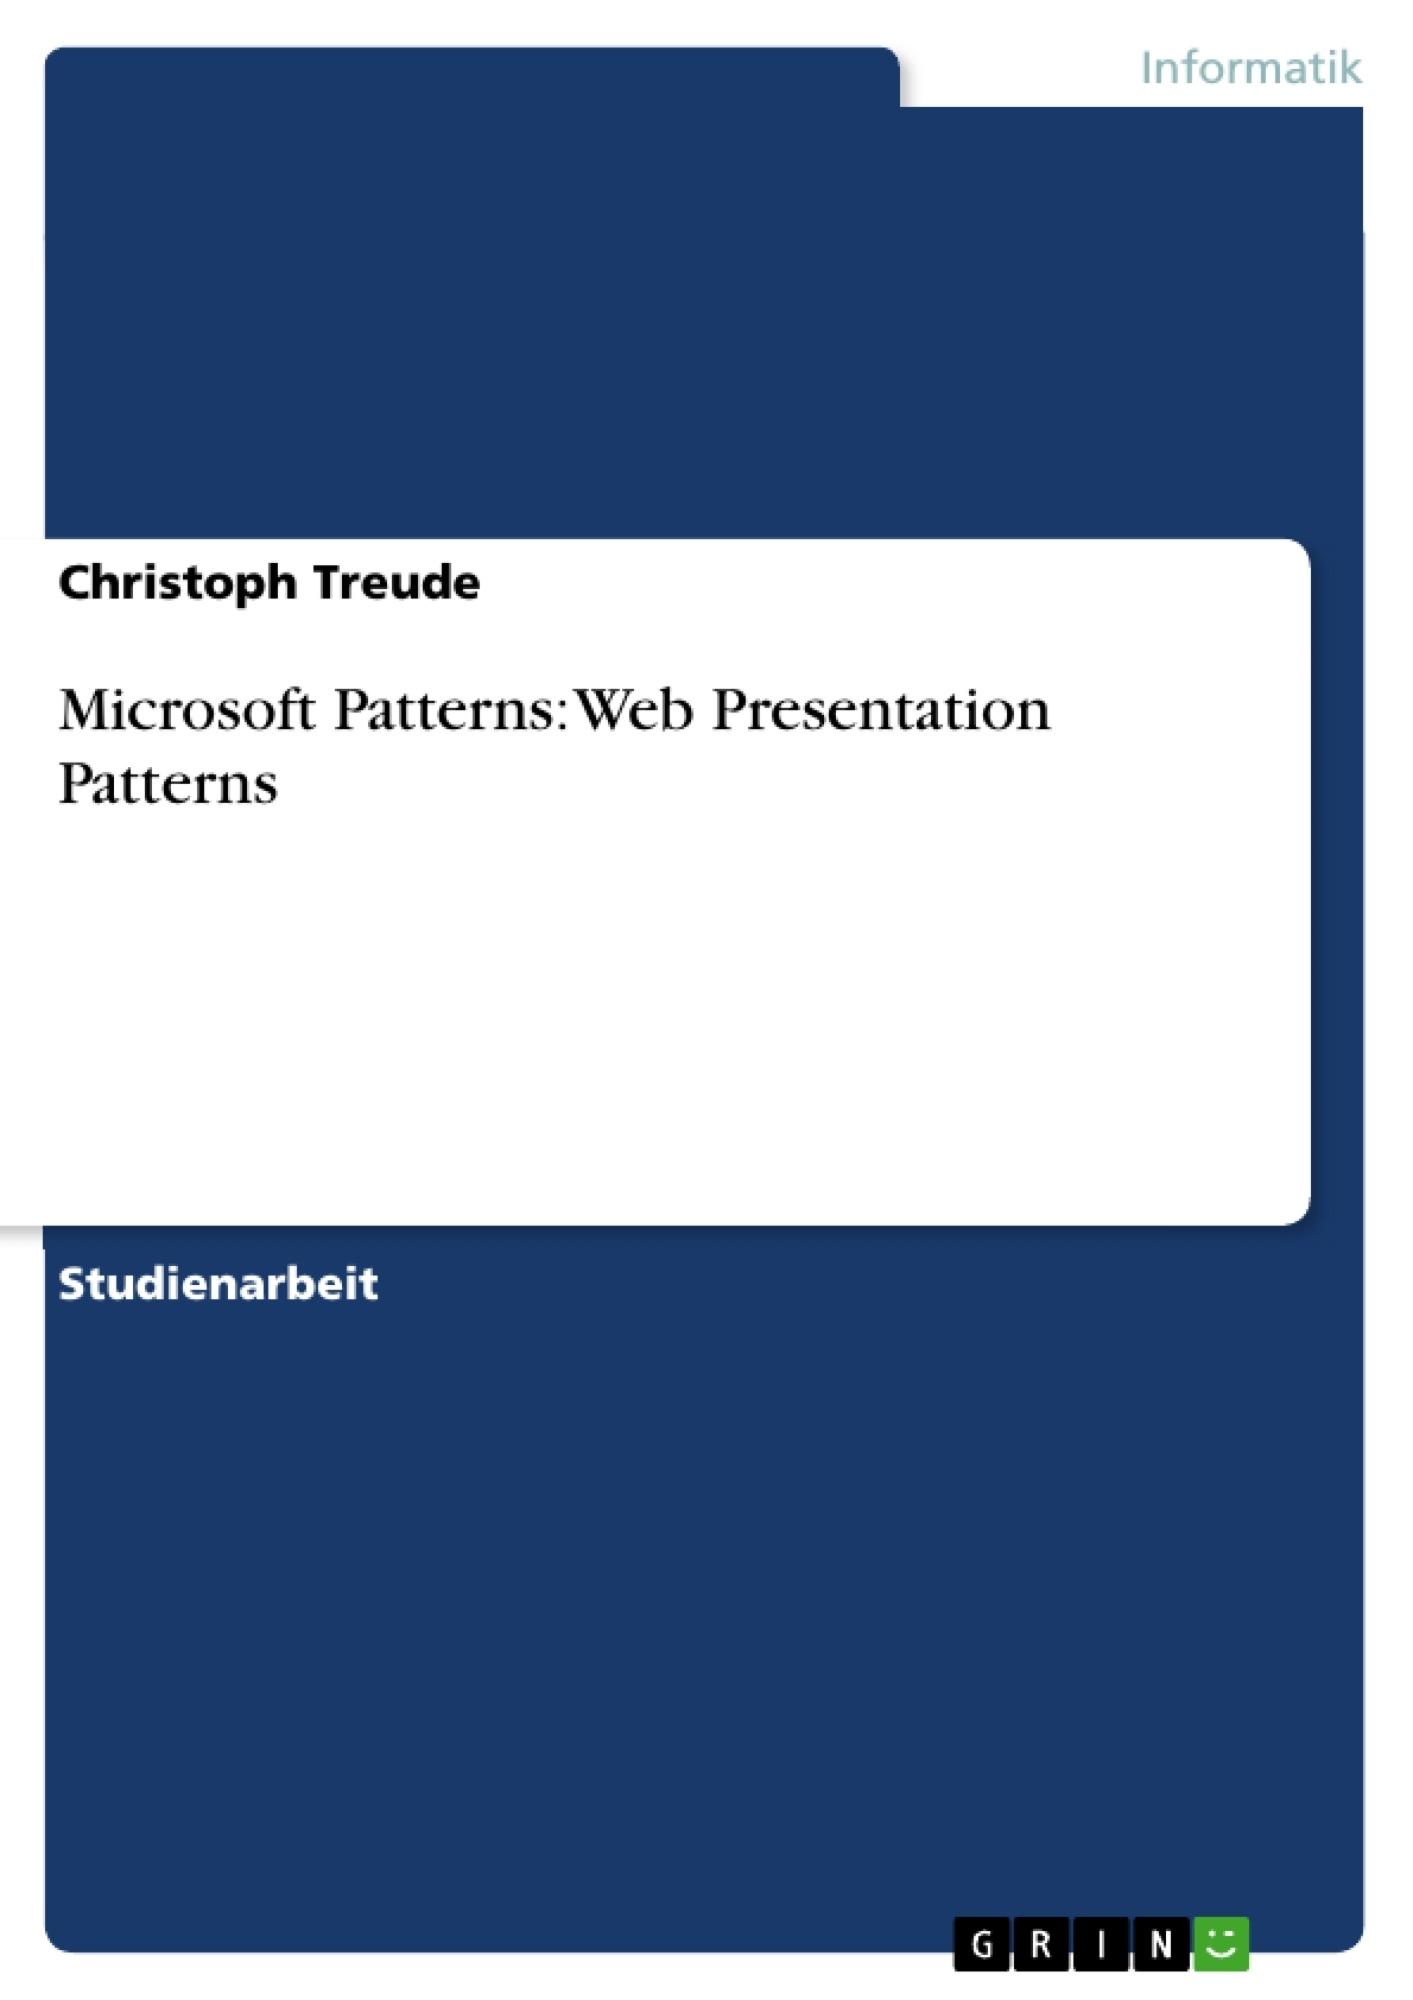 Titel: Microsoft Patterns: Web Presentation Patterns